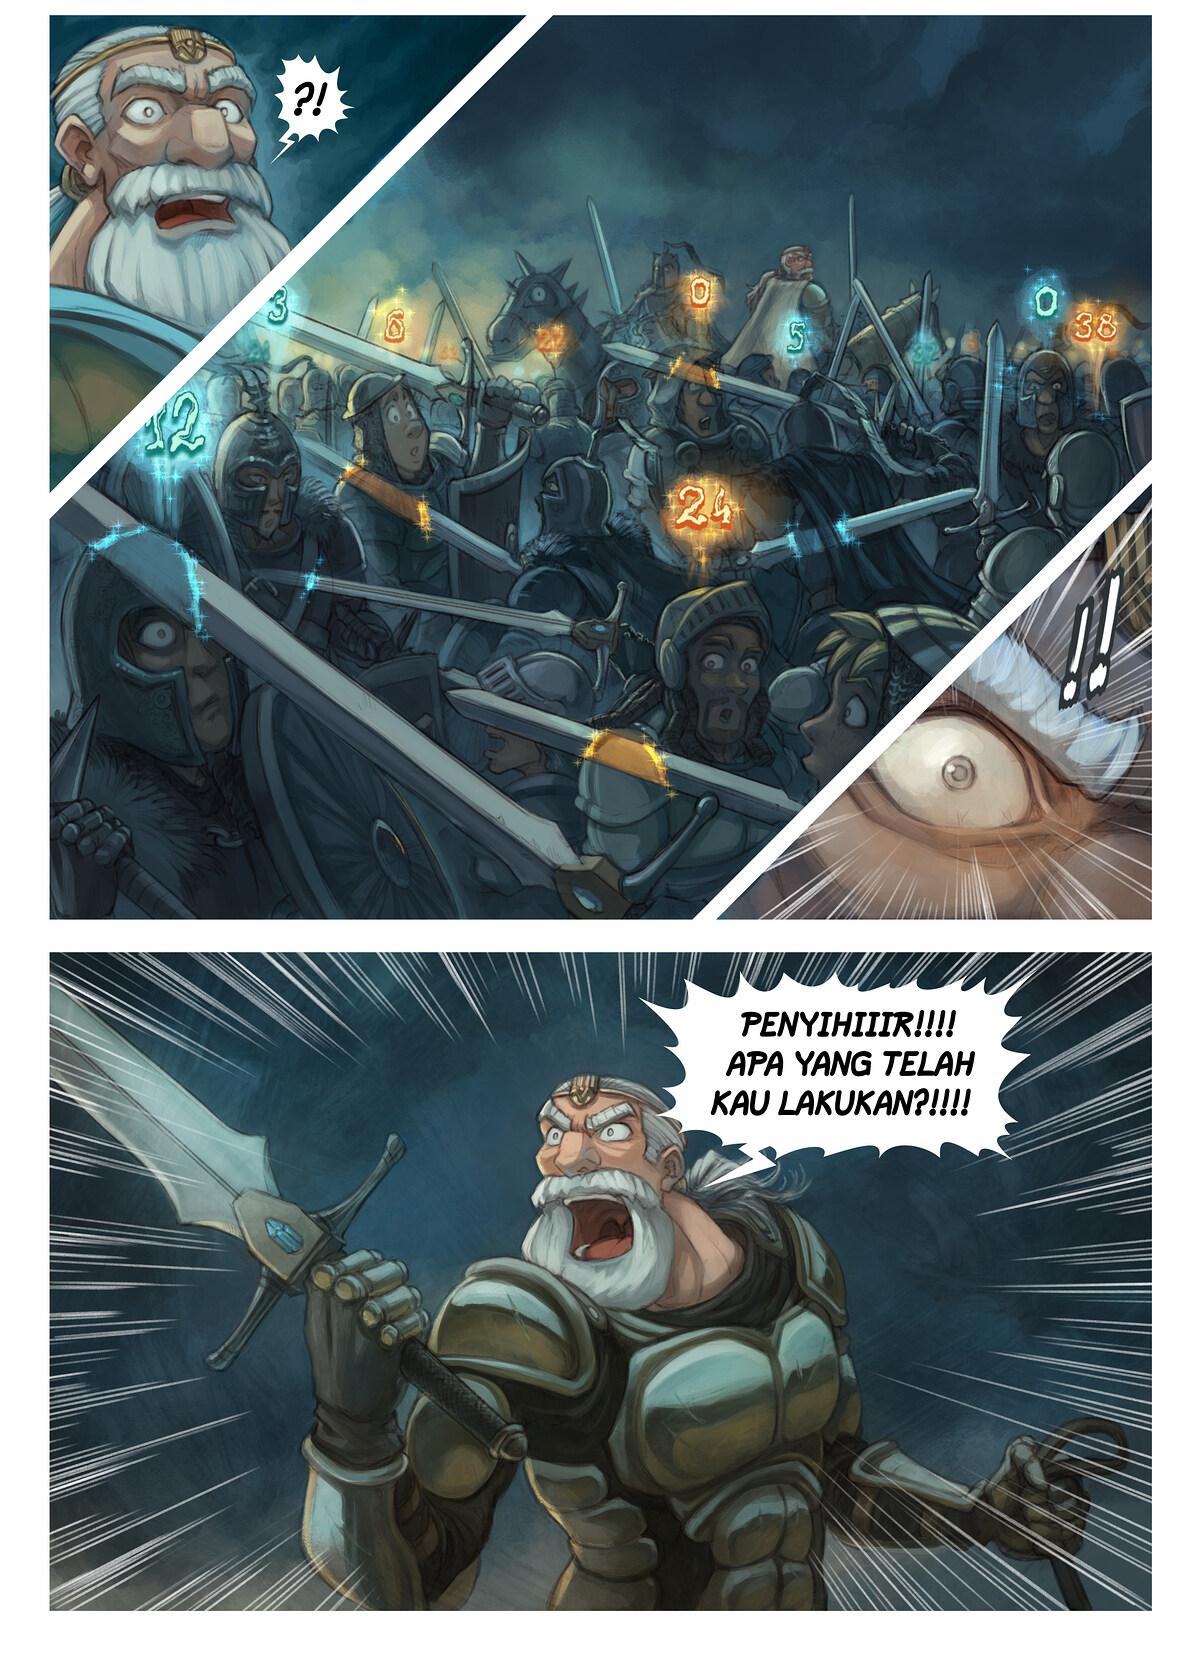 Episode 33: Mantra Perang, Page 6